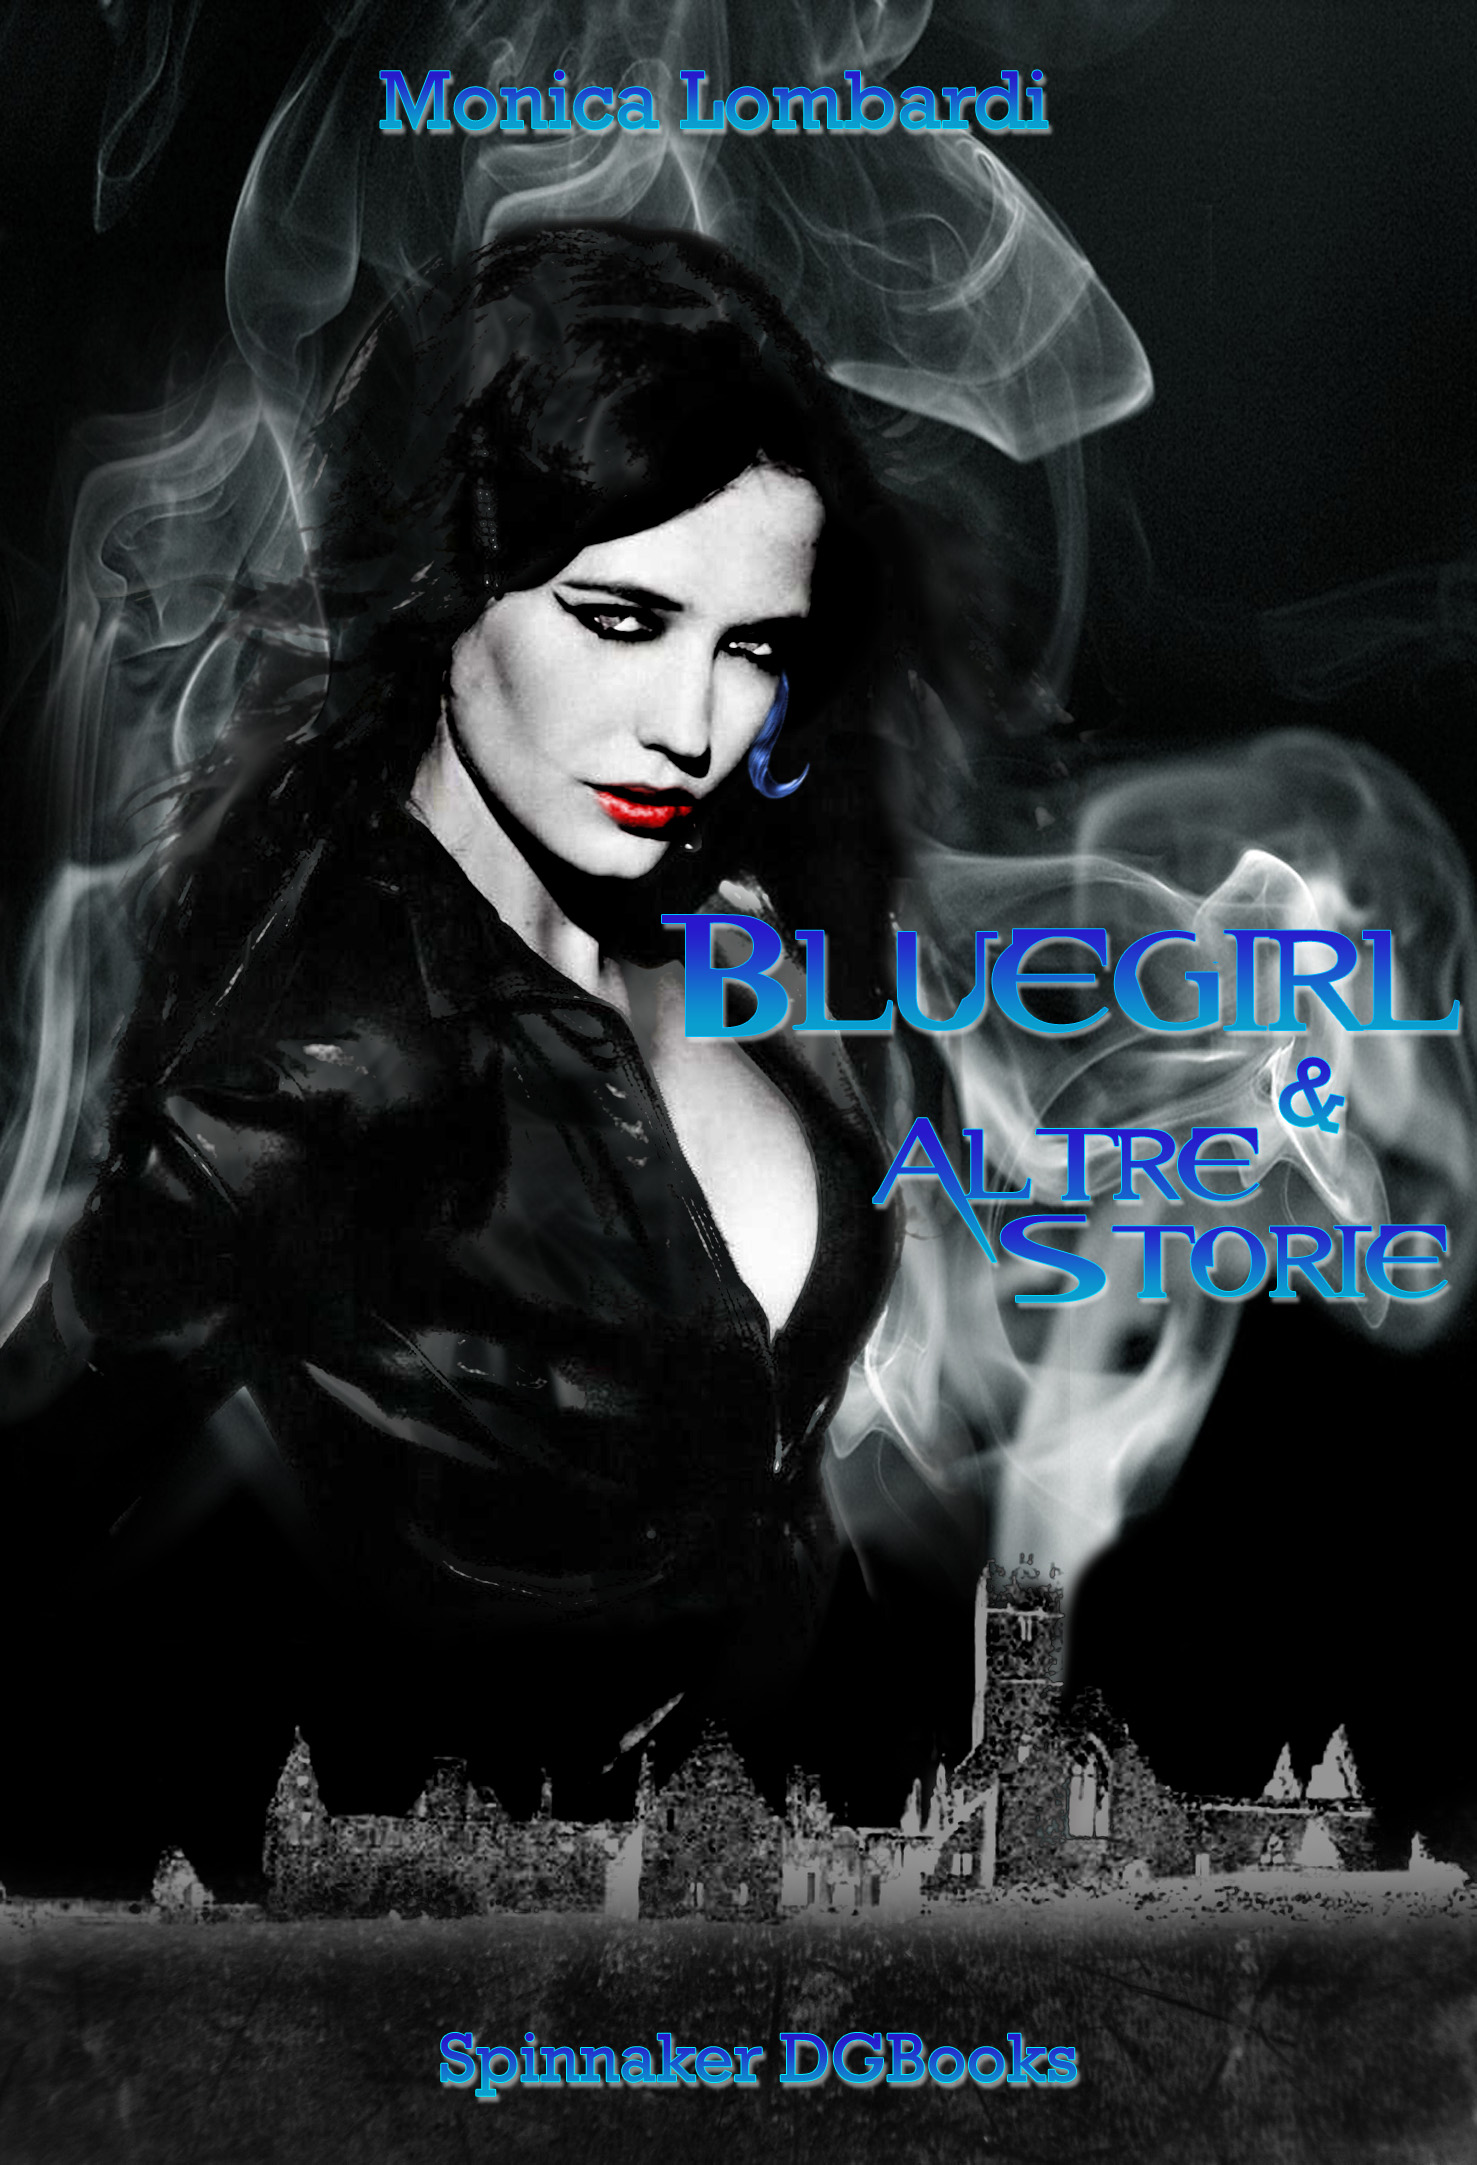 Bluegirl e altre storie